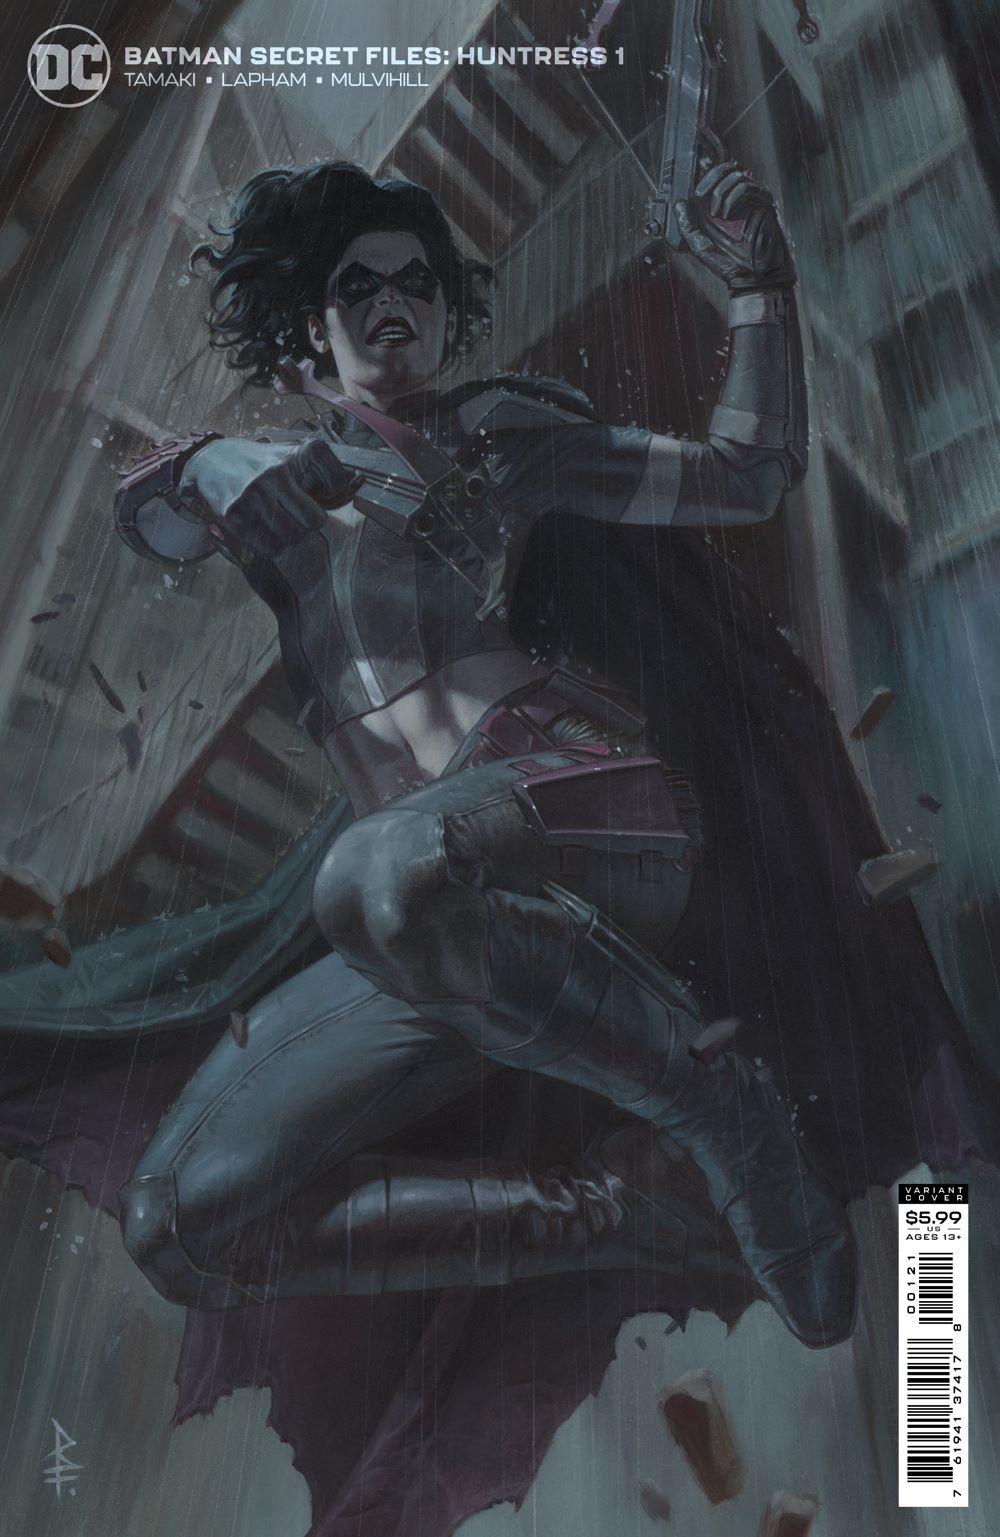 BMSF_HNTRSS_Cv1_var DC Comics July 2021 Solicitations